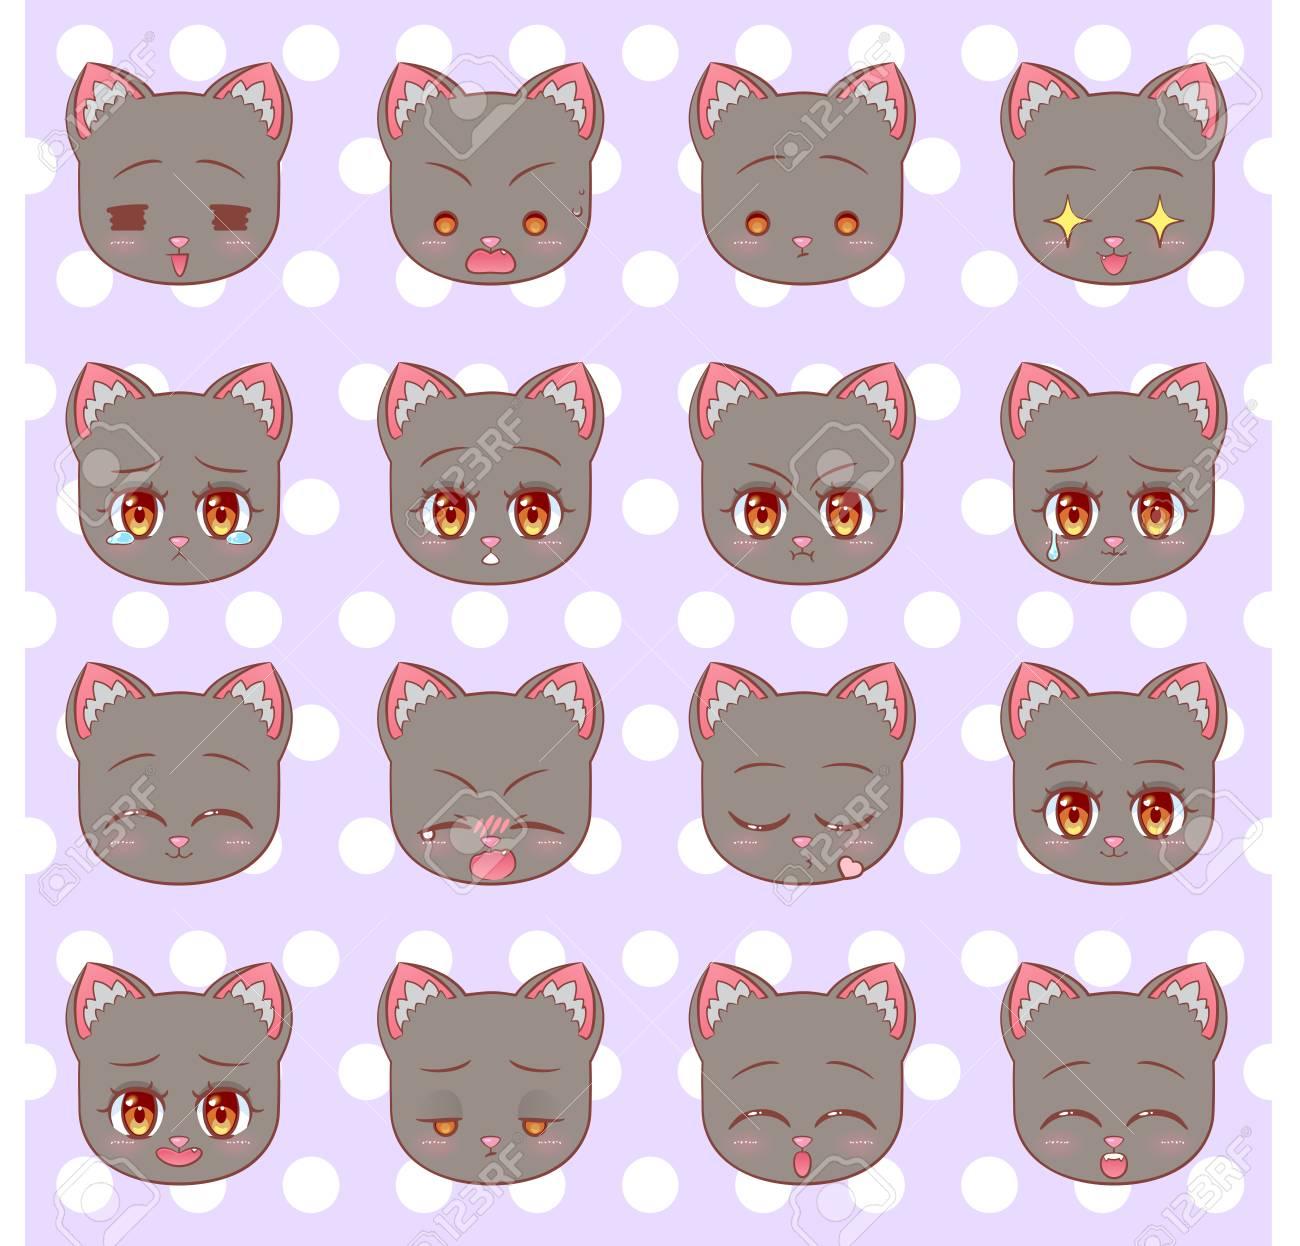 Emoticons emoji smiley set colorful sweet kitty little cute kawaii anime cartoon cat kitten girl